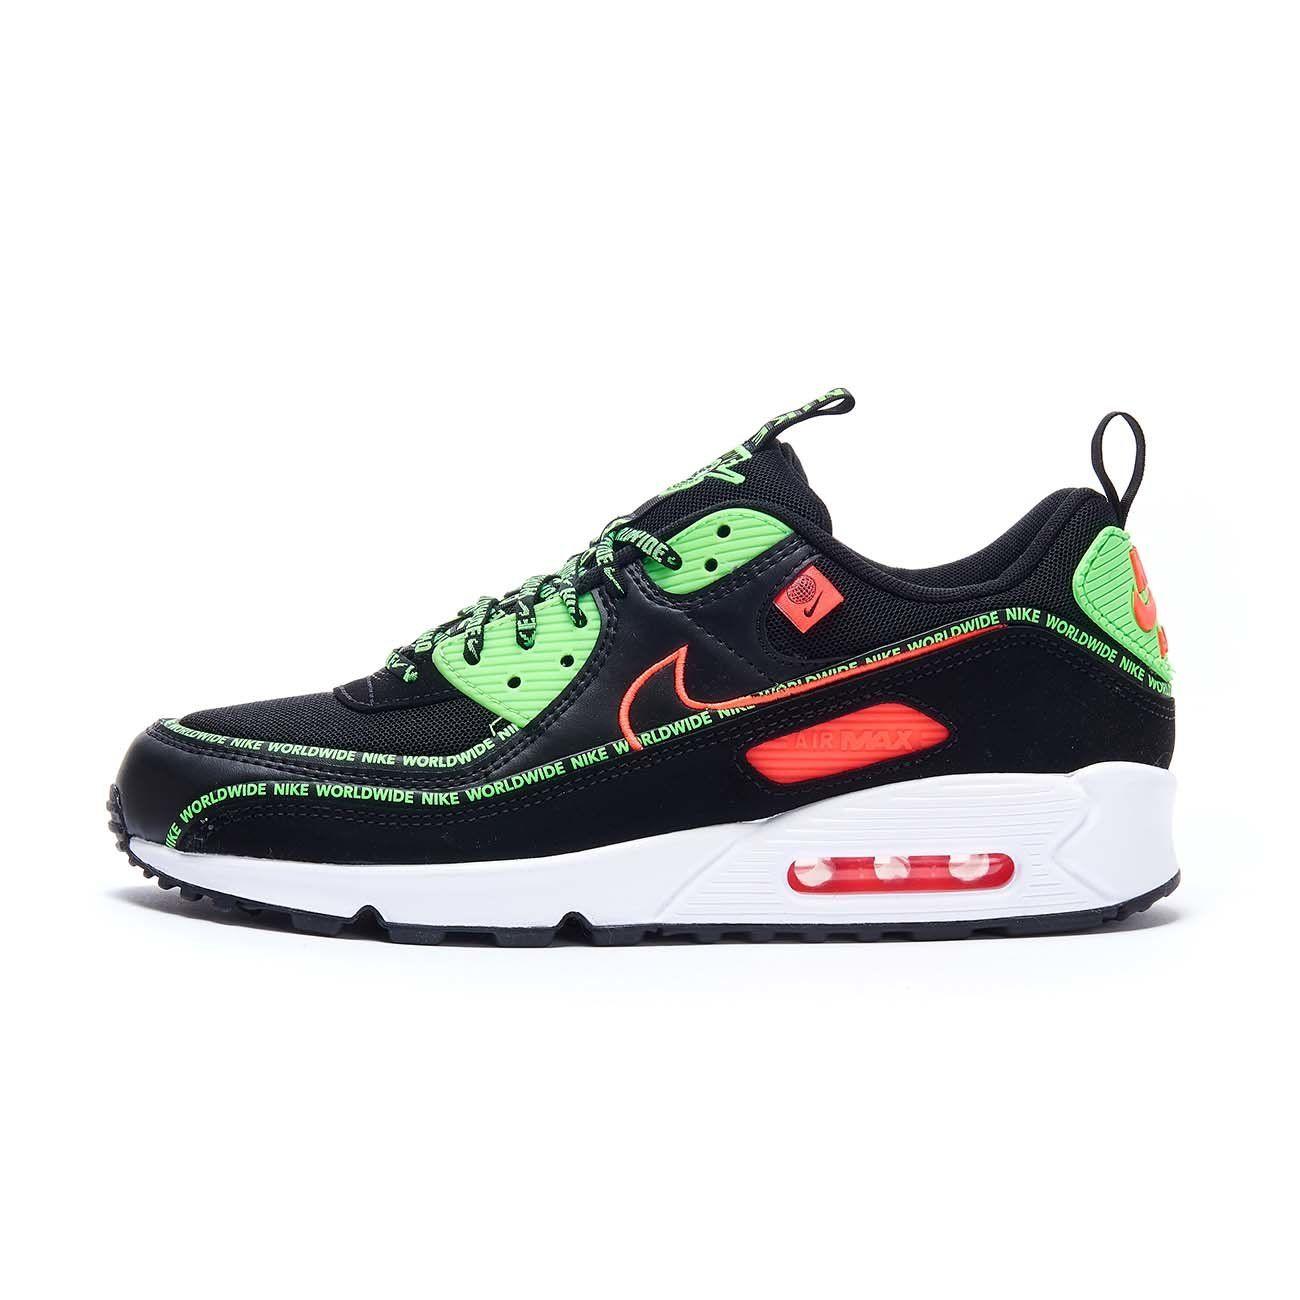 NIKE AIR MAX 90 SE SNEAKERS Man Black Green   Mascheroni Sportswear